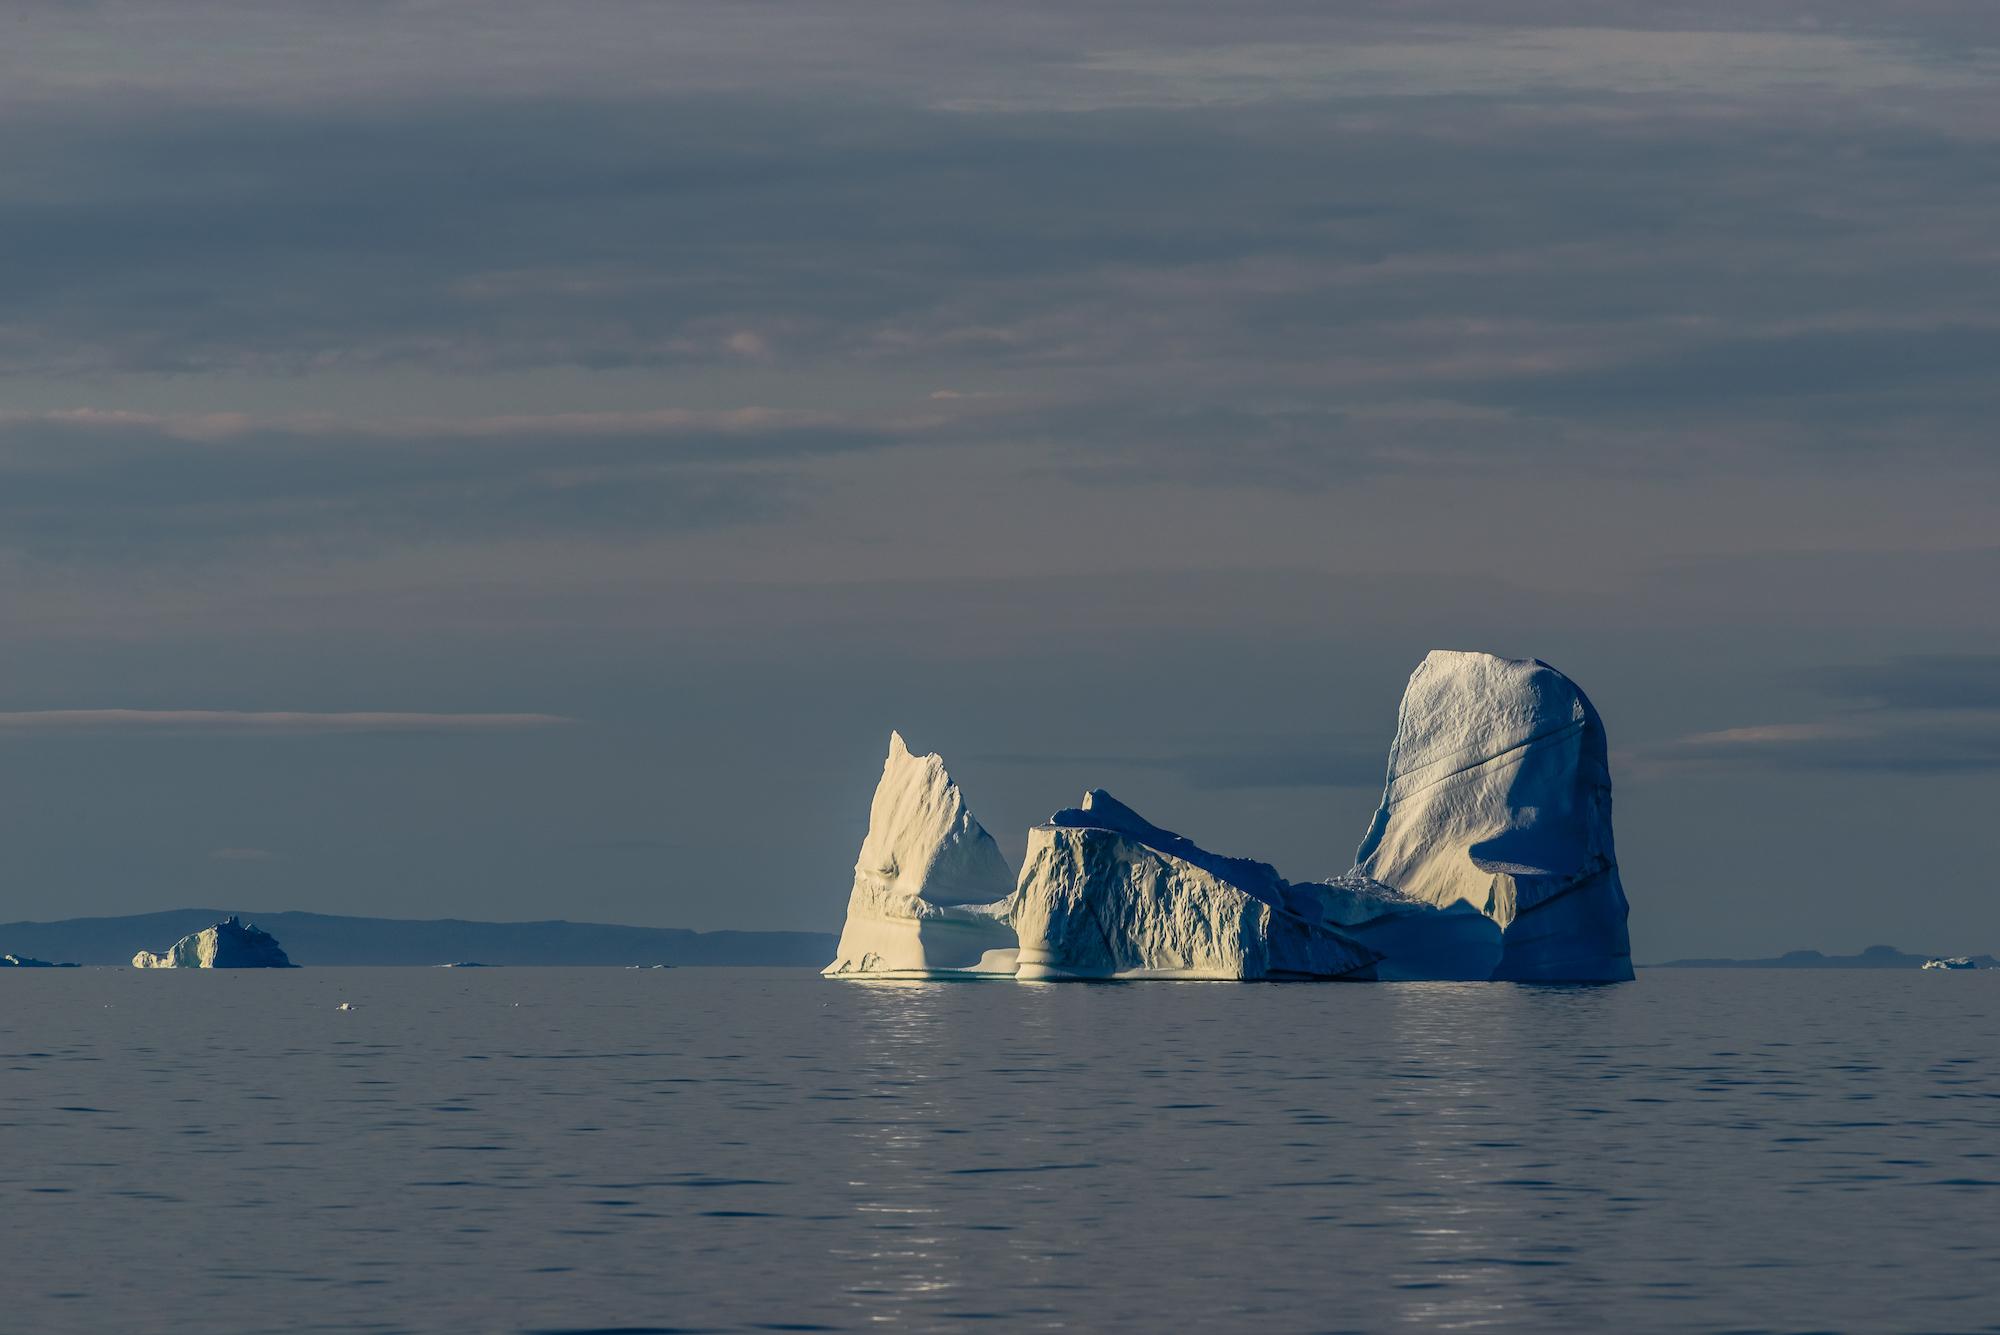 Iceberg in Calm Seas